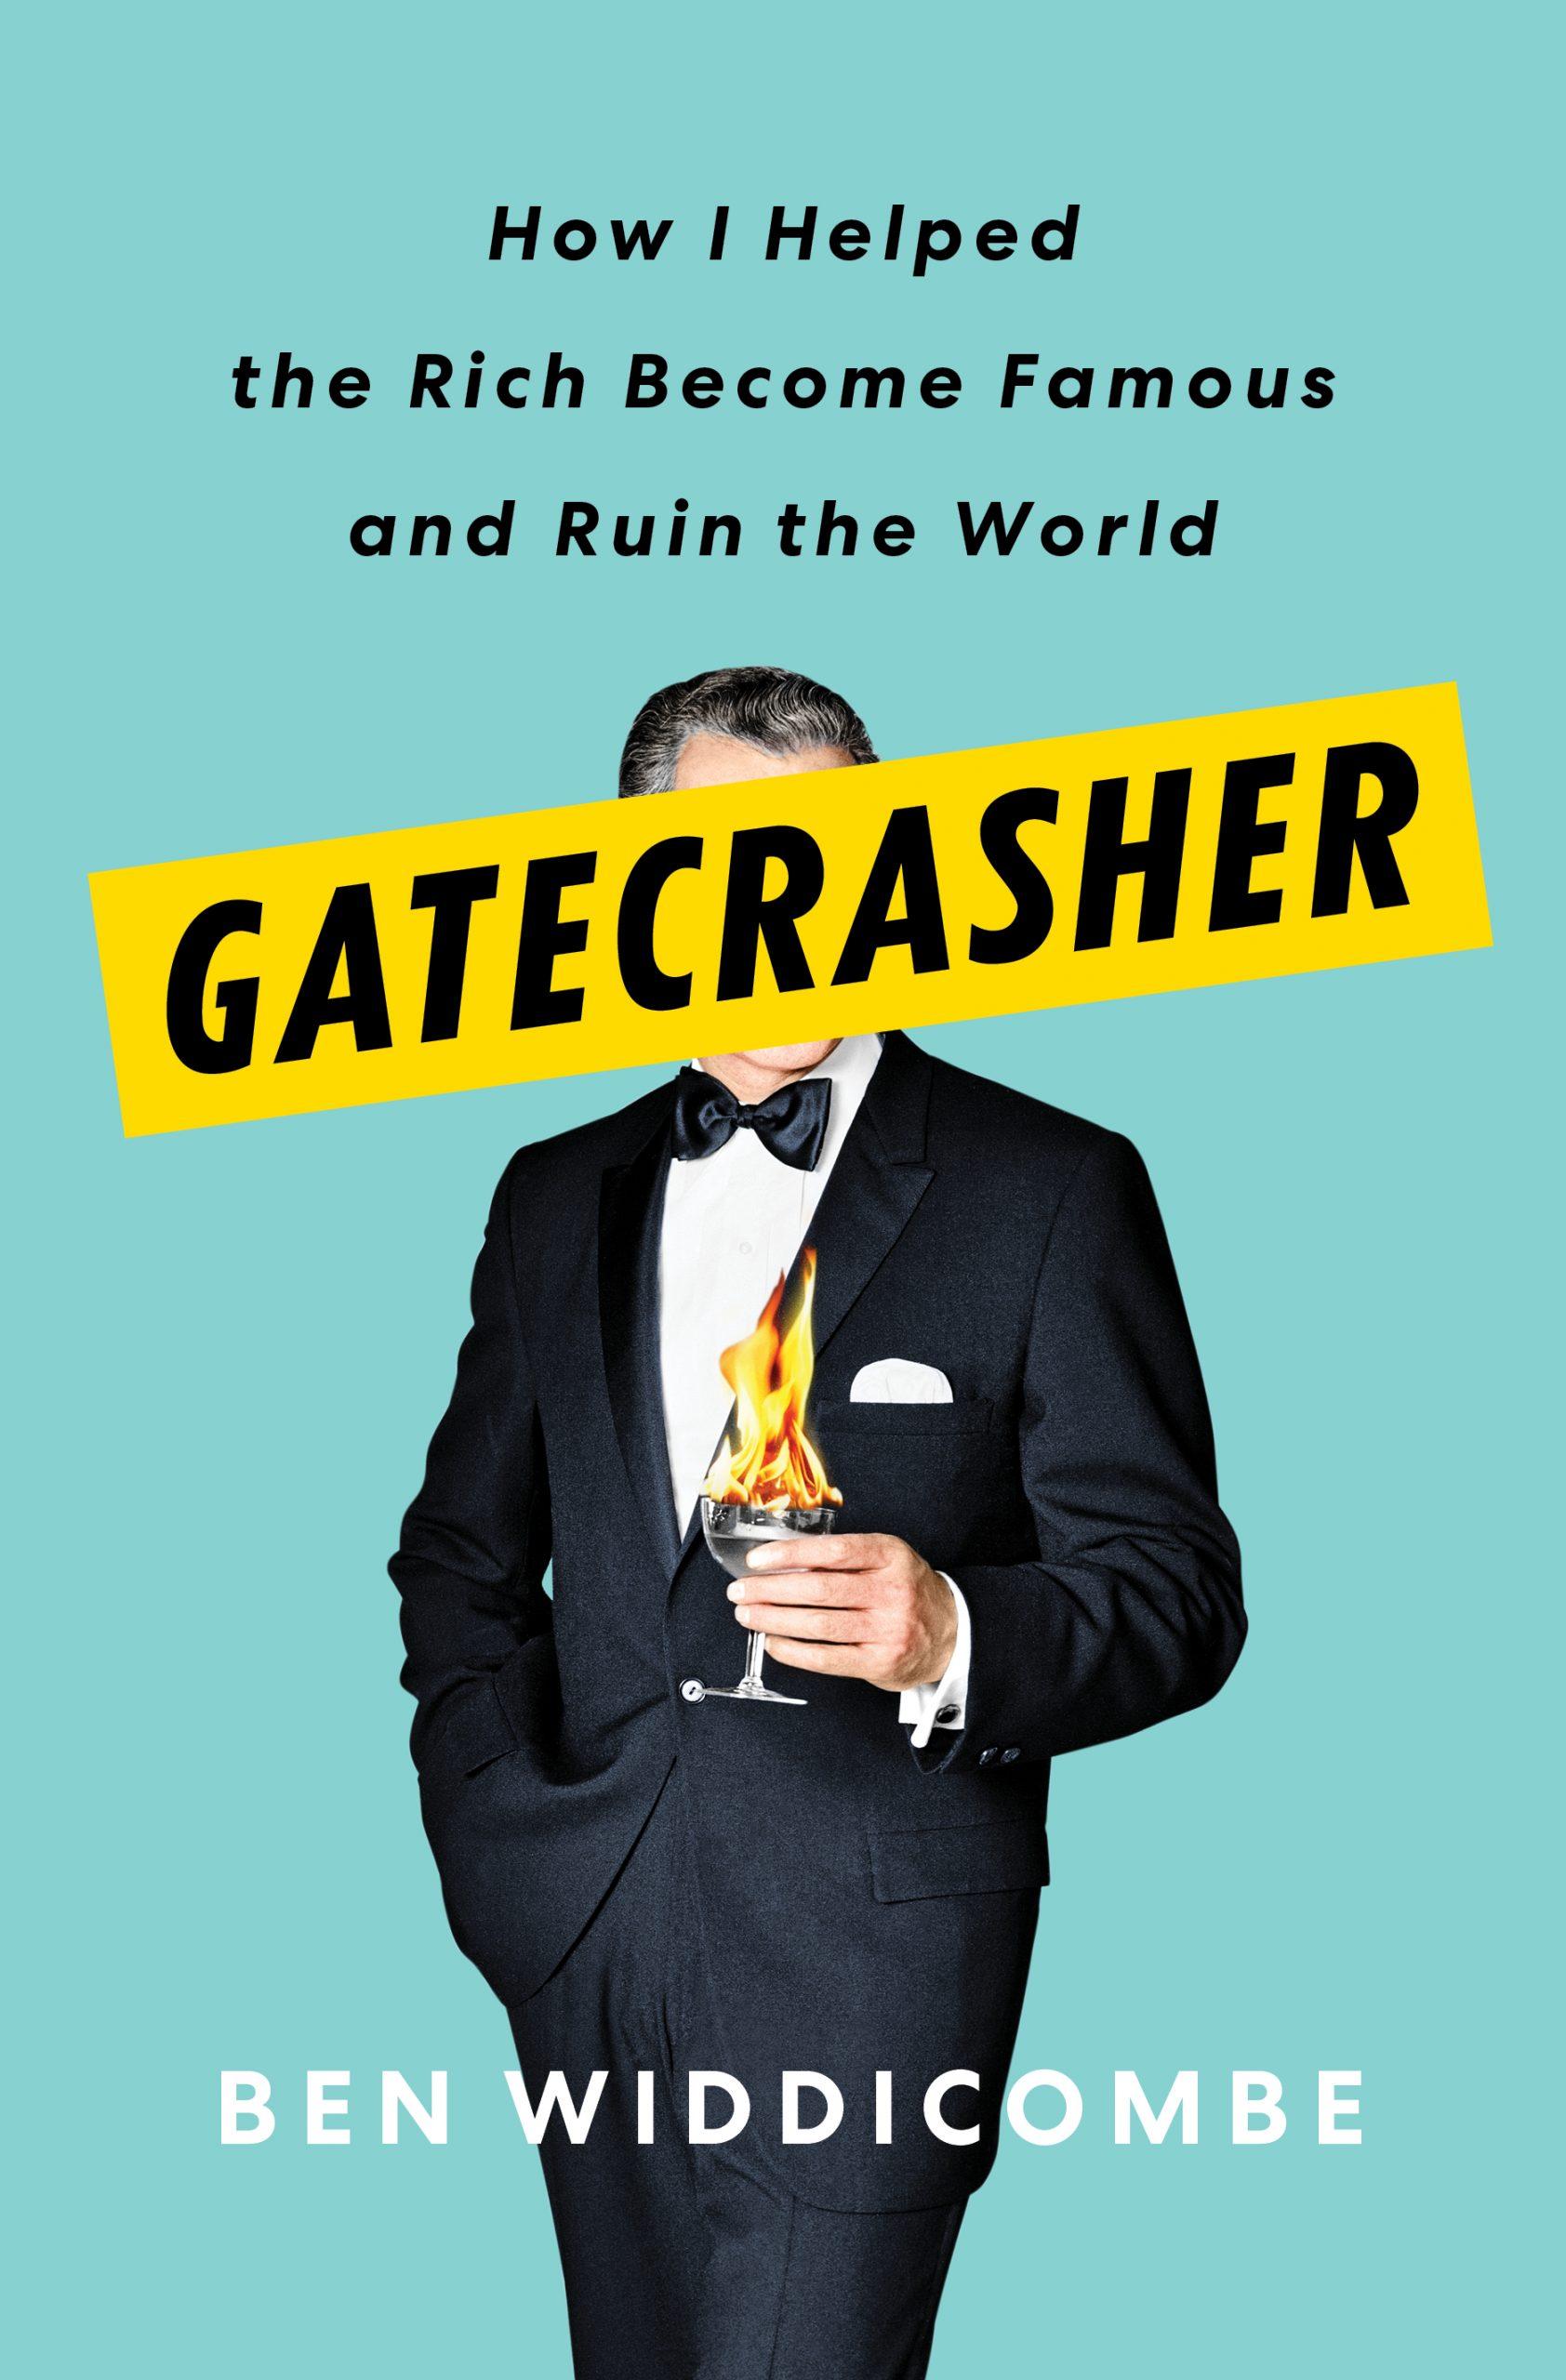 gatecrasher book